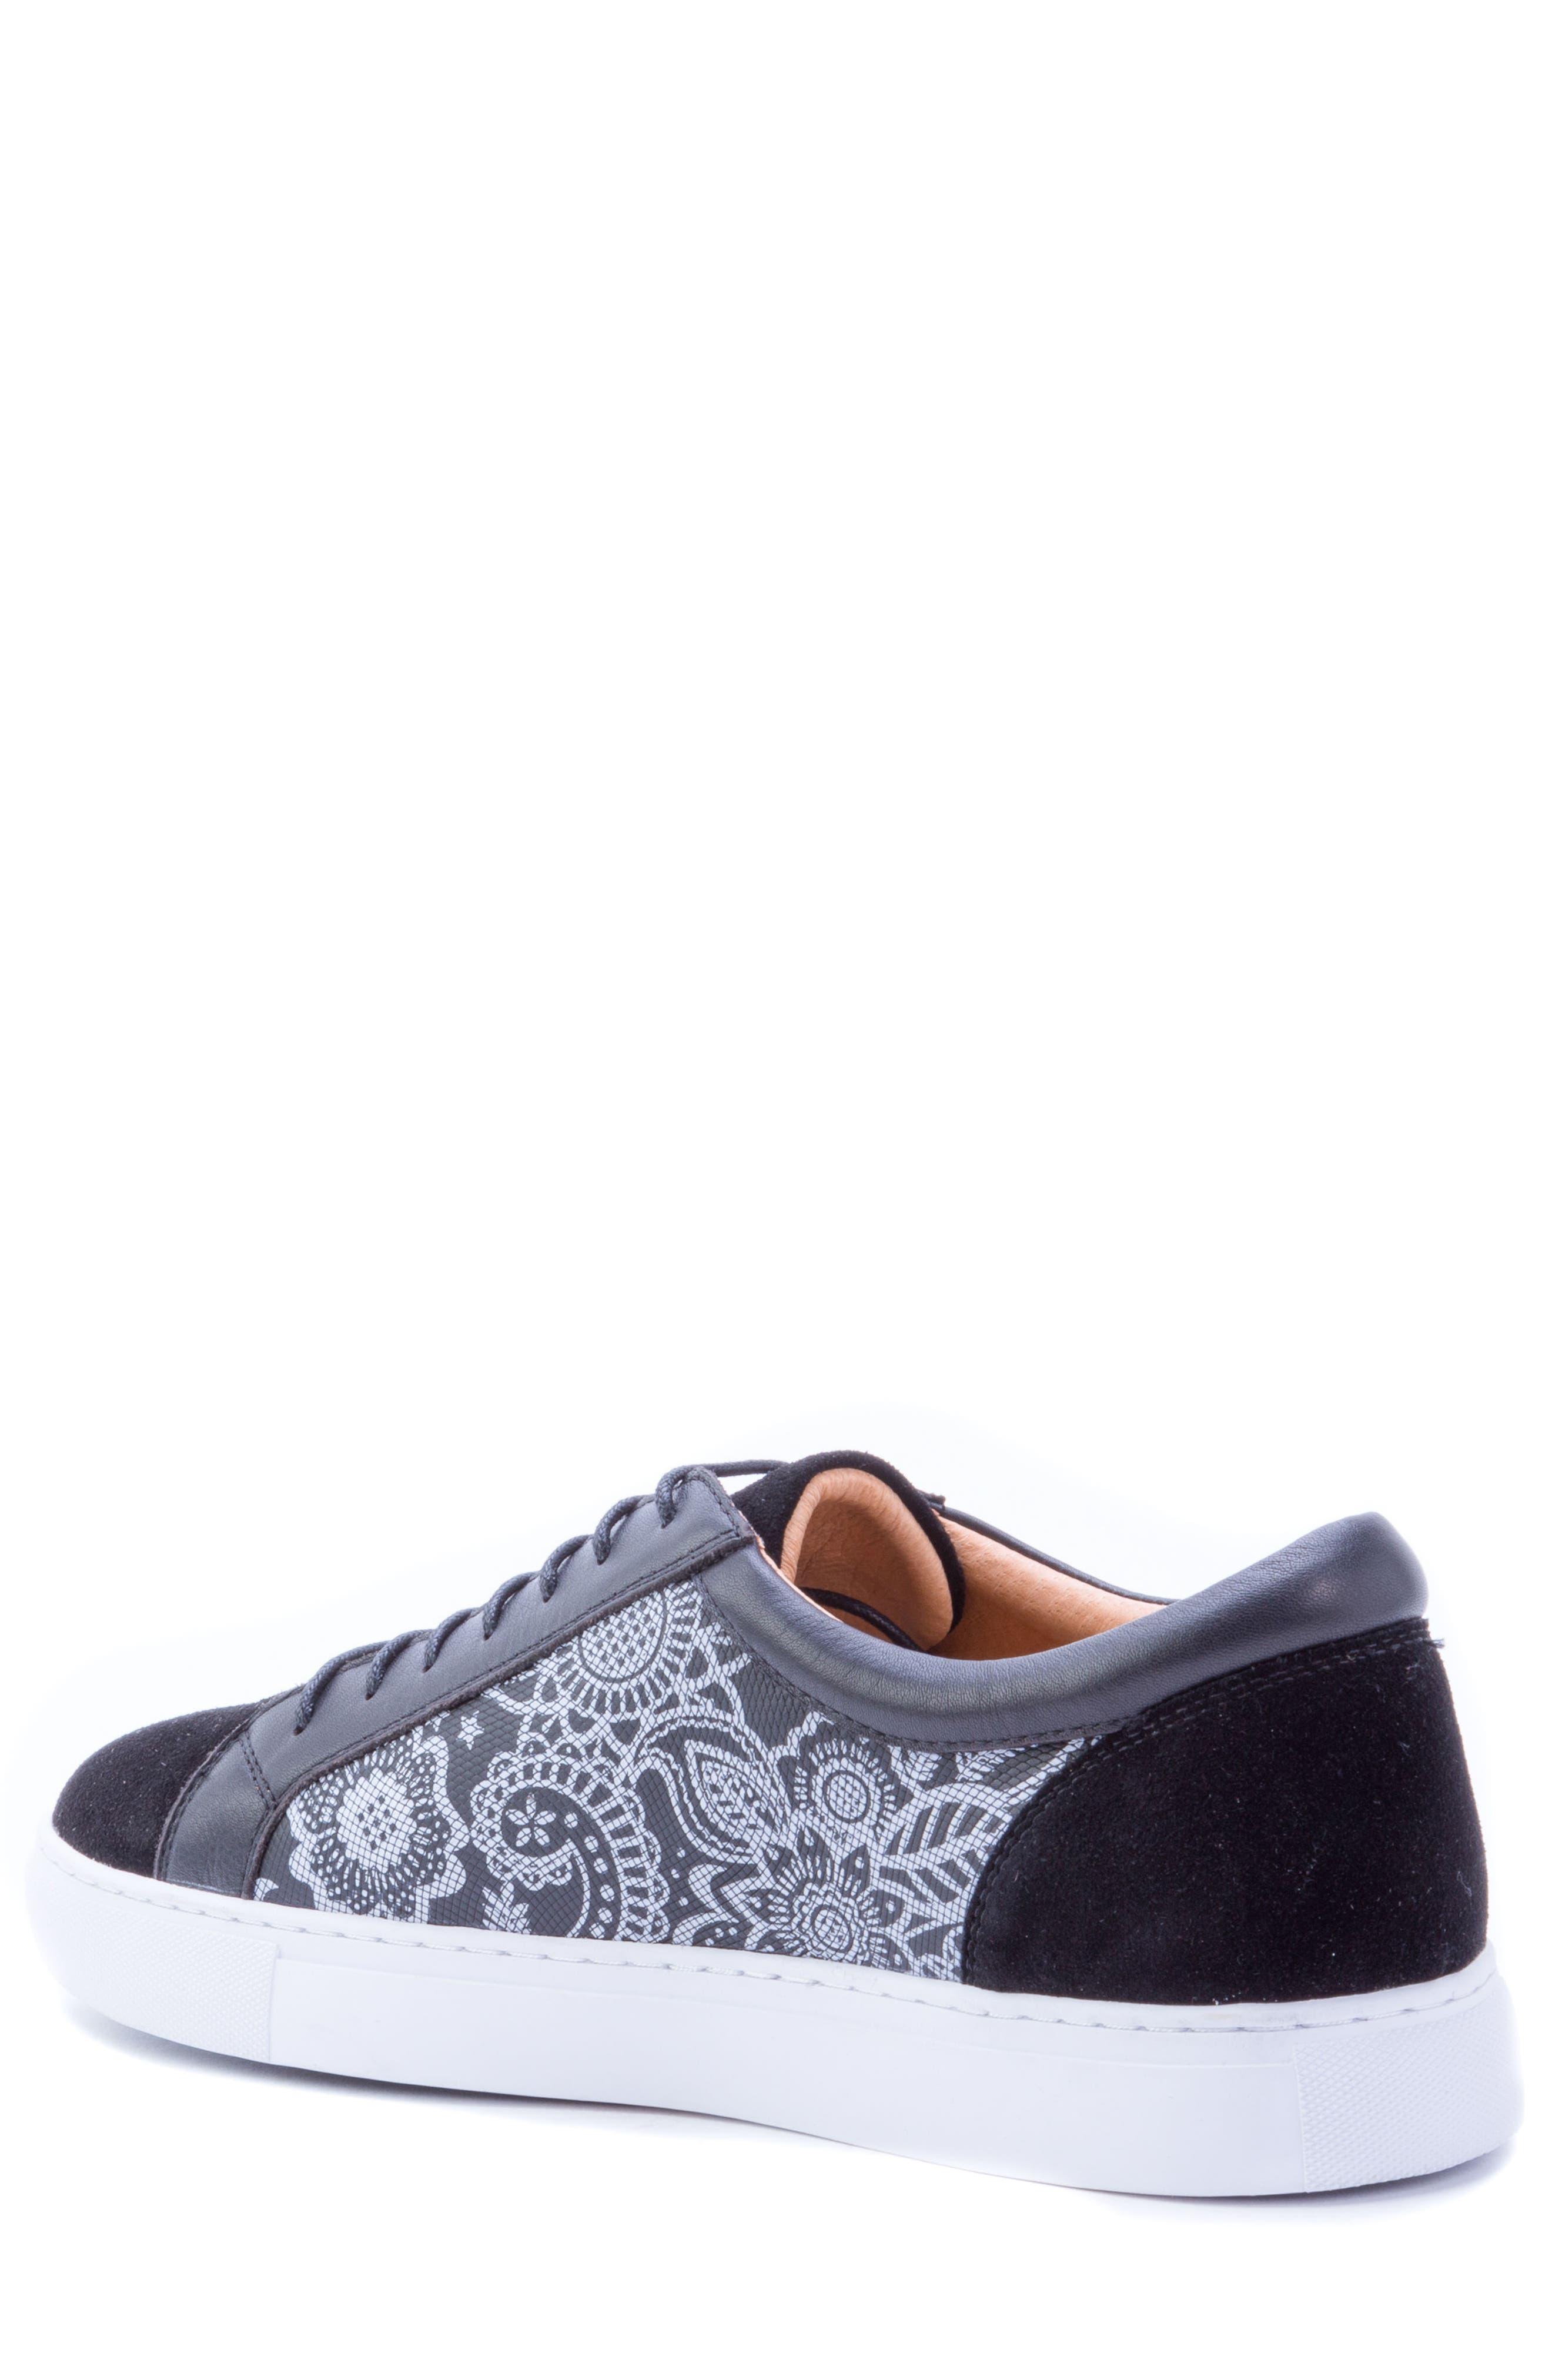 Rubio Floral Sneaker,                             Alternate thumbnail 2, color,                             BLACK SUEDE